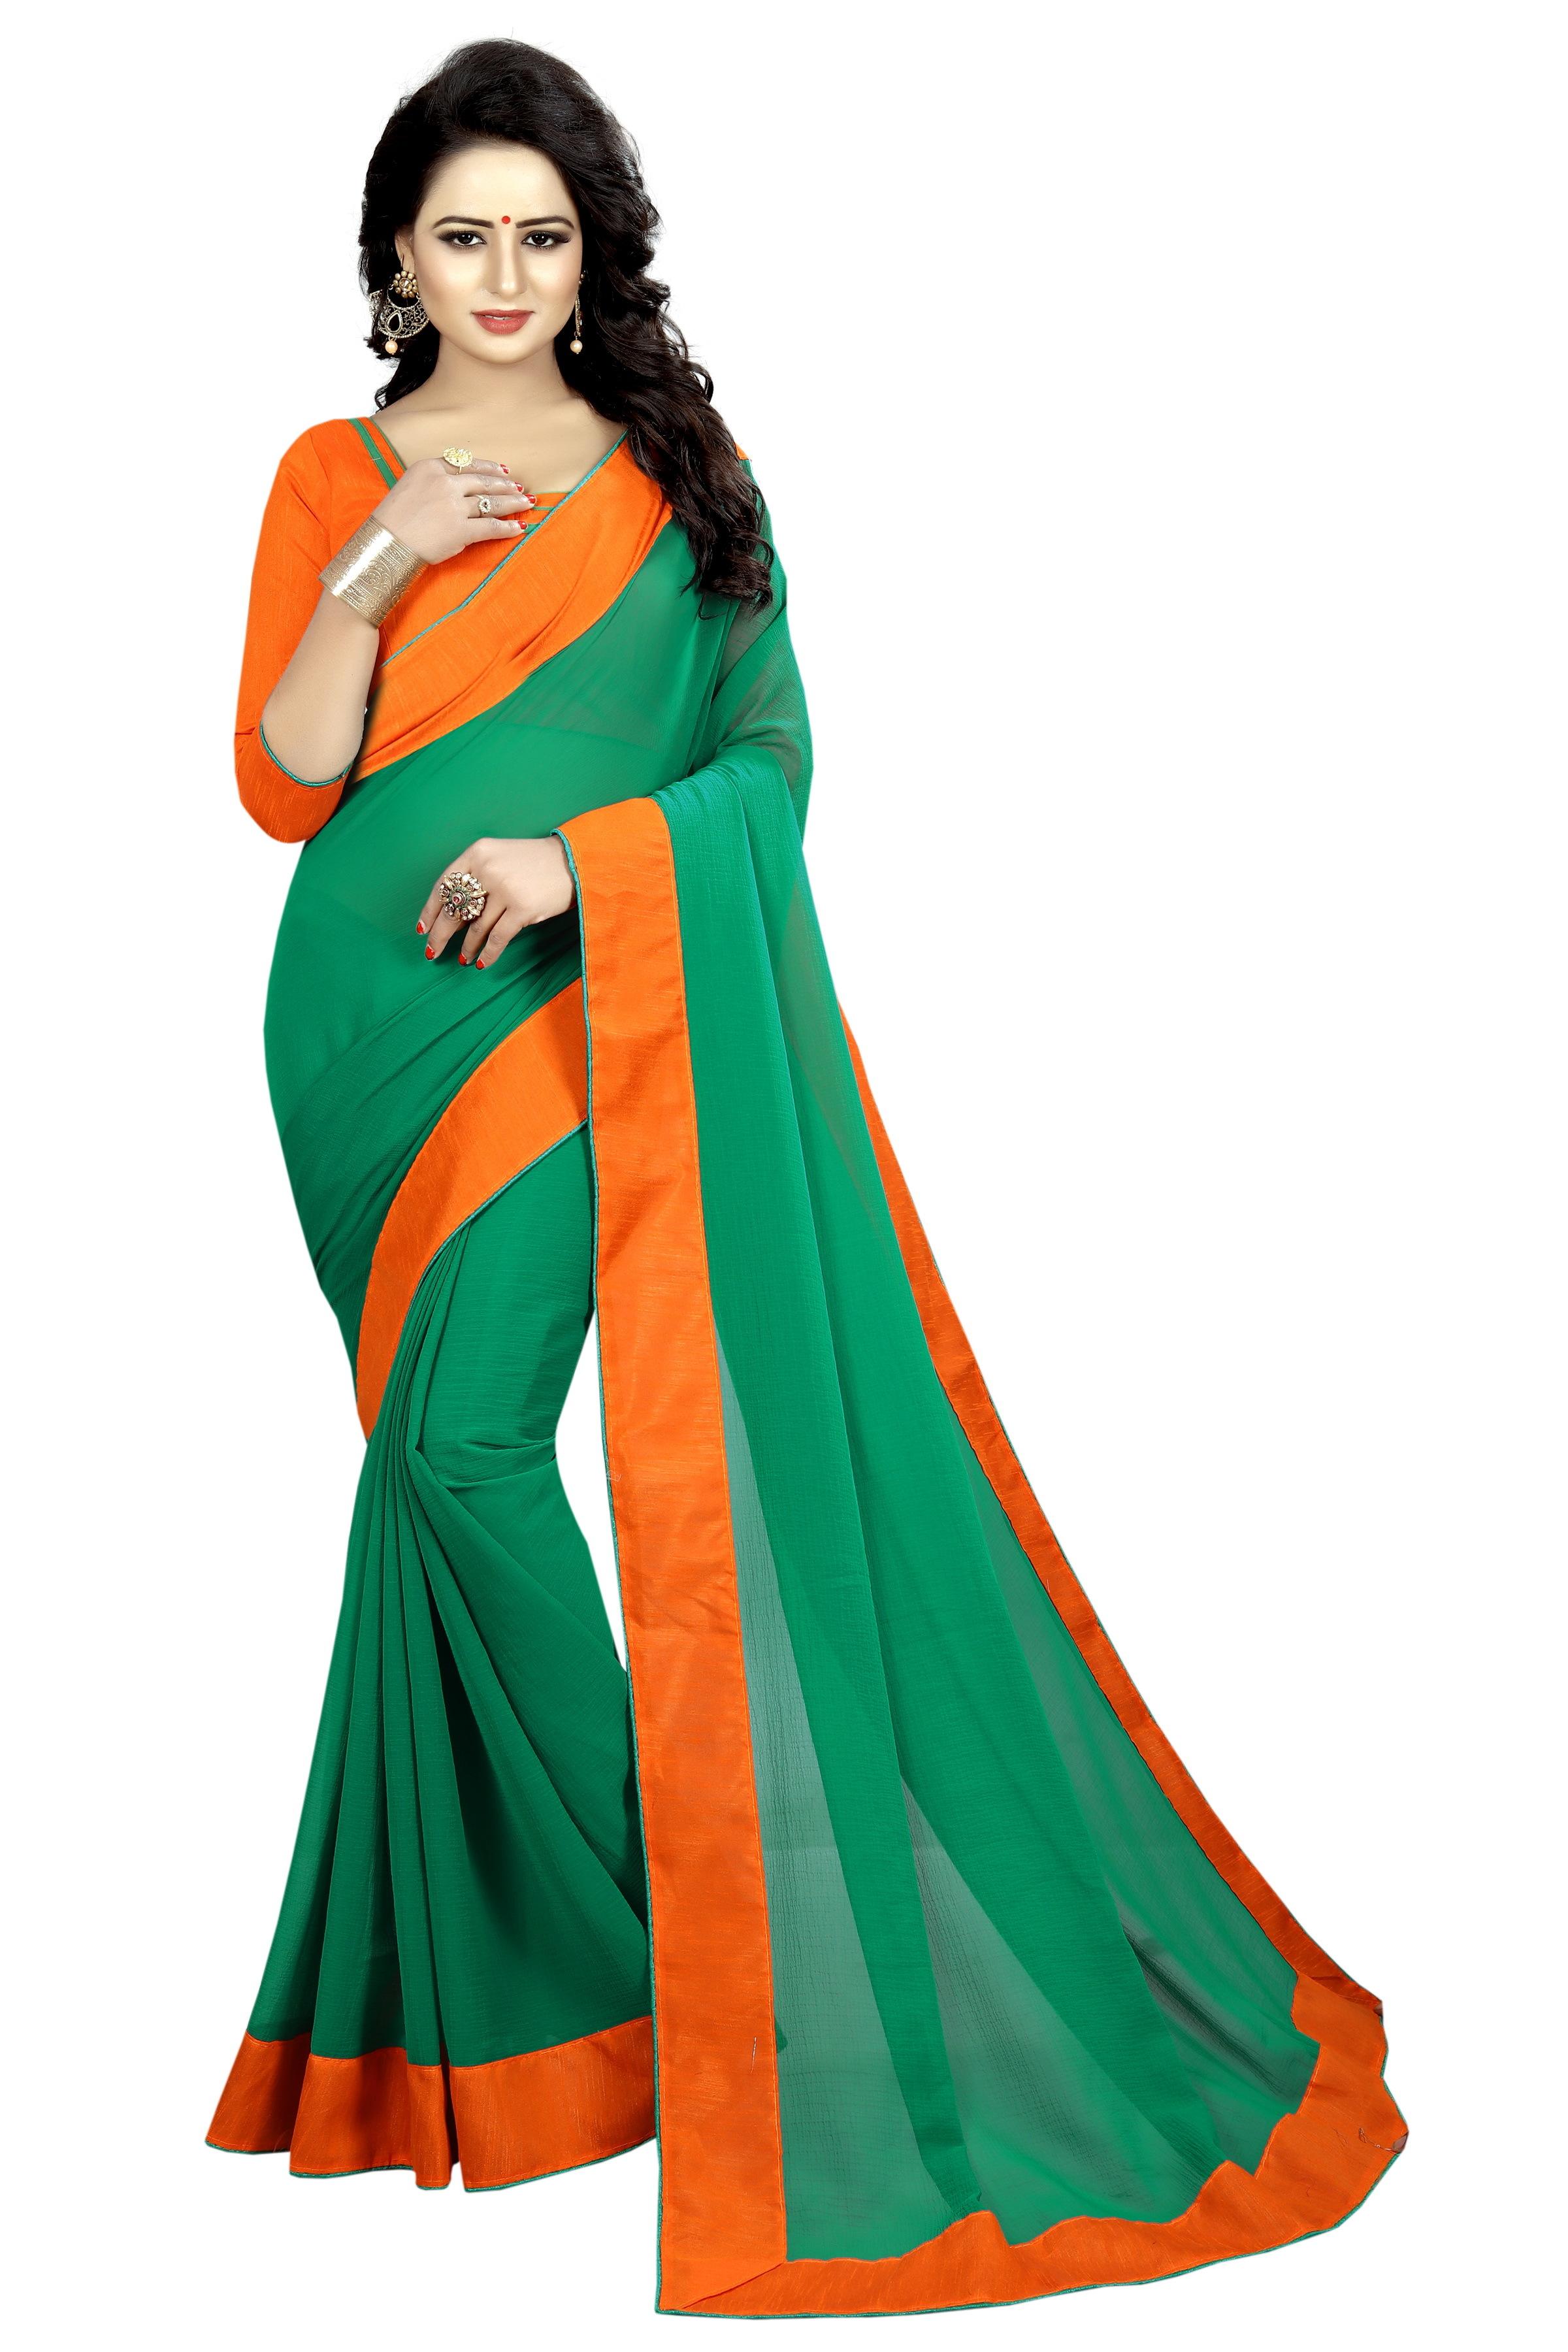 Chiffon Saree with Contrast Border